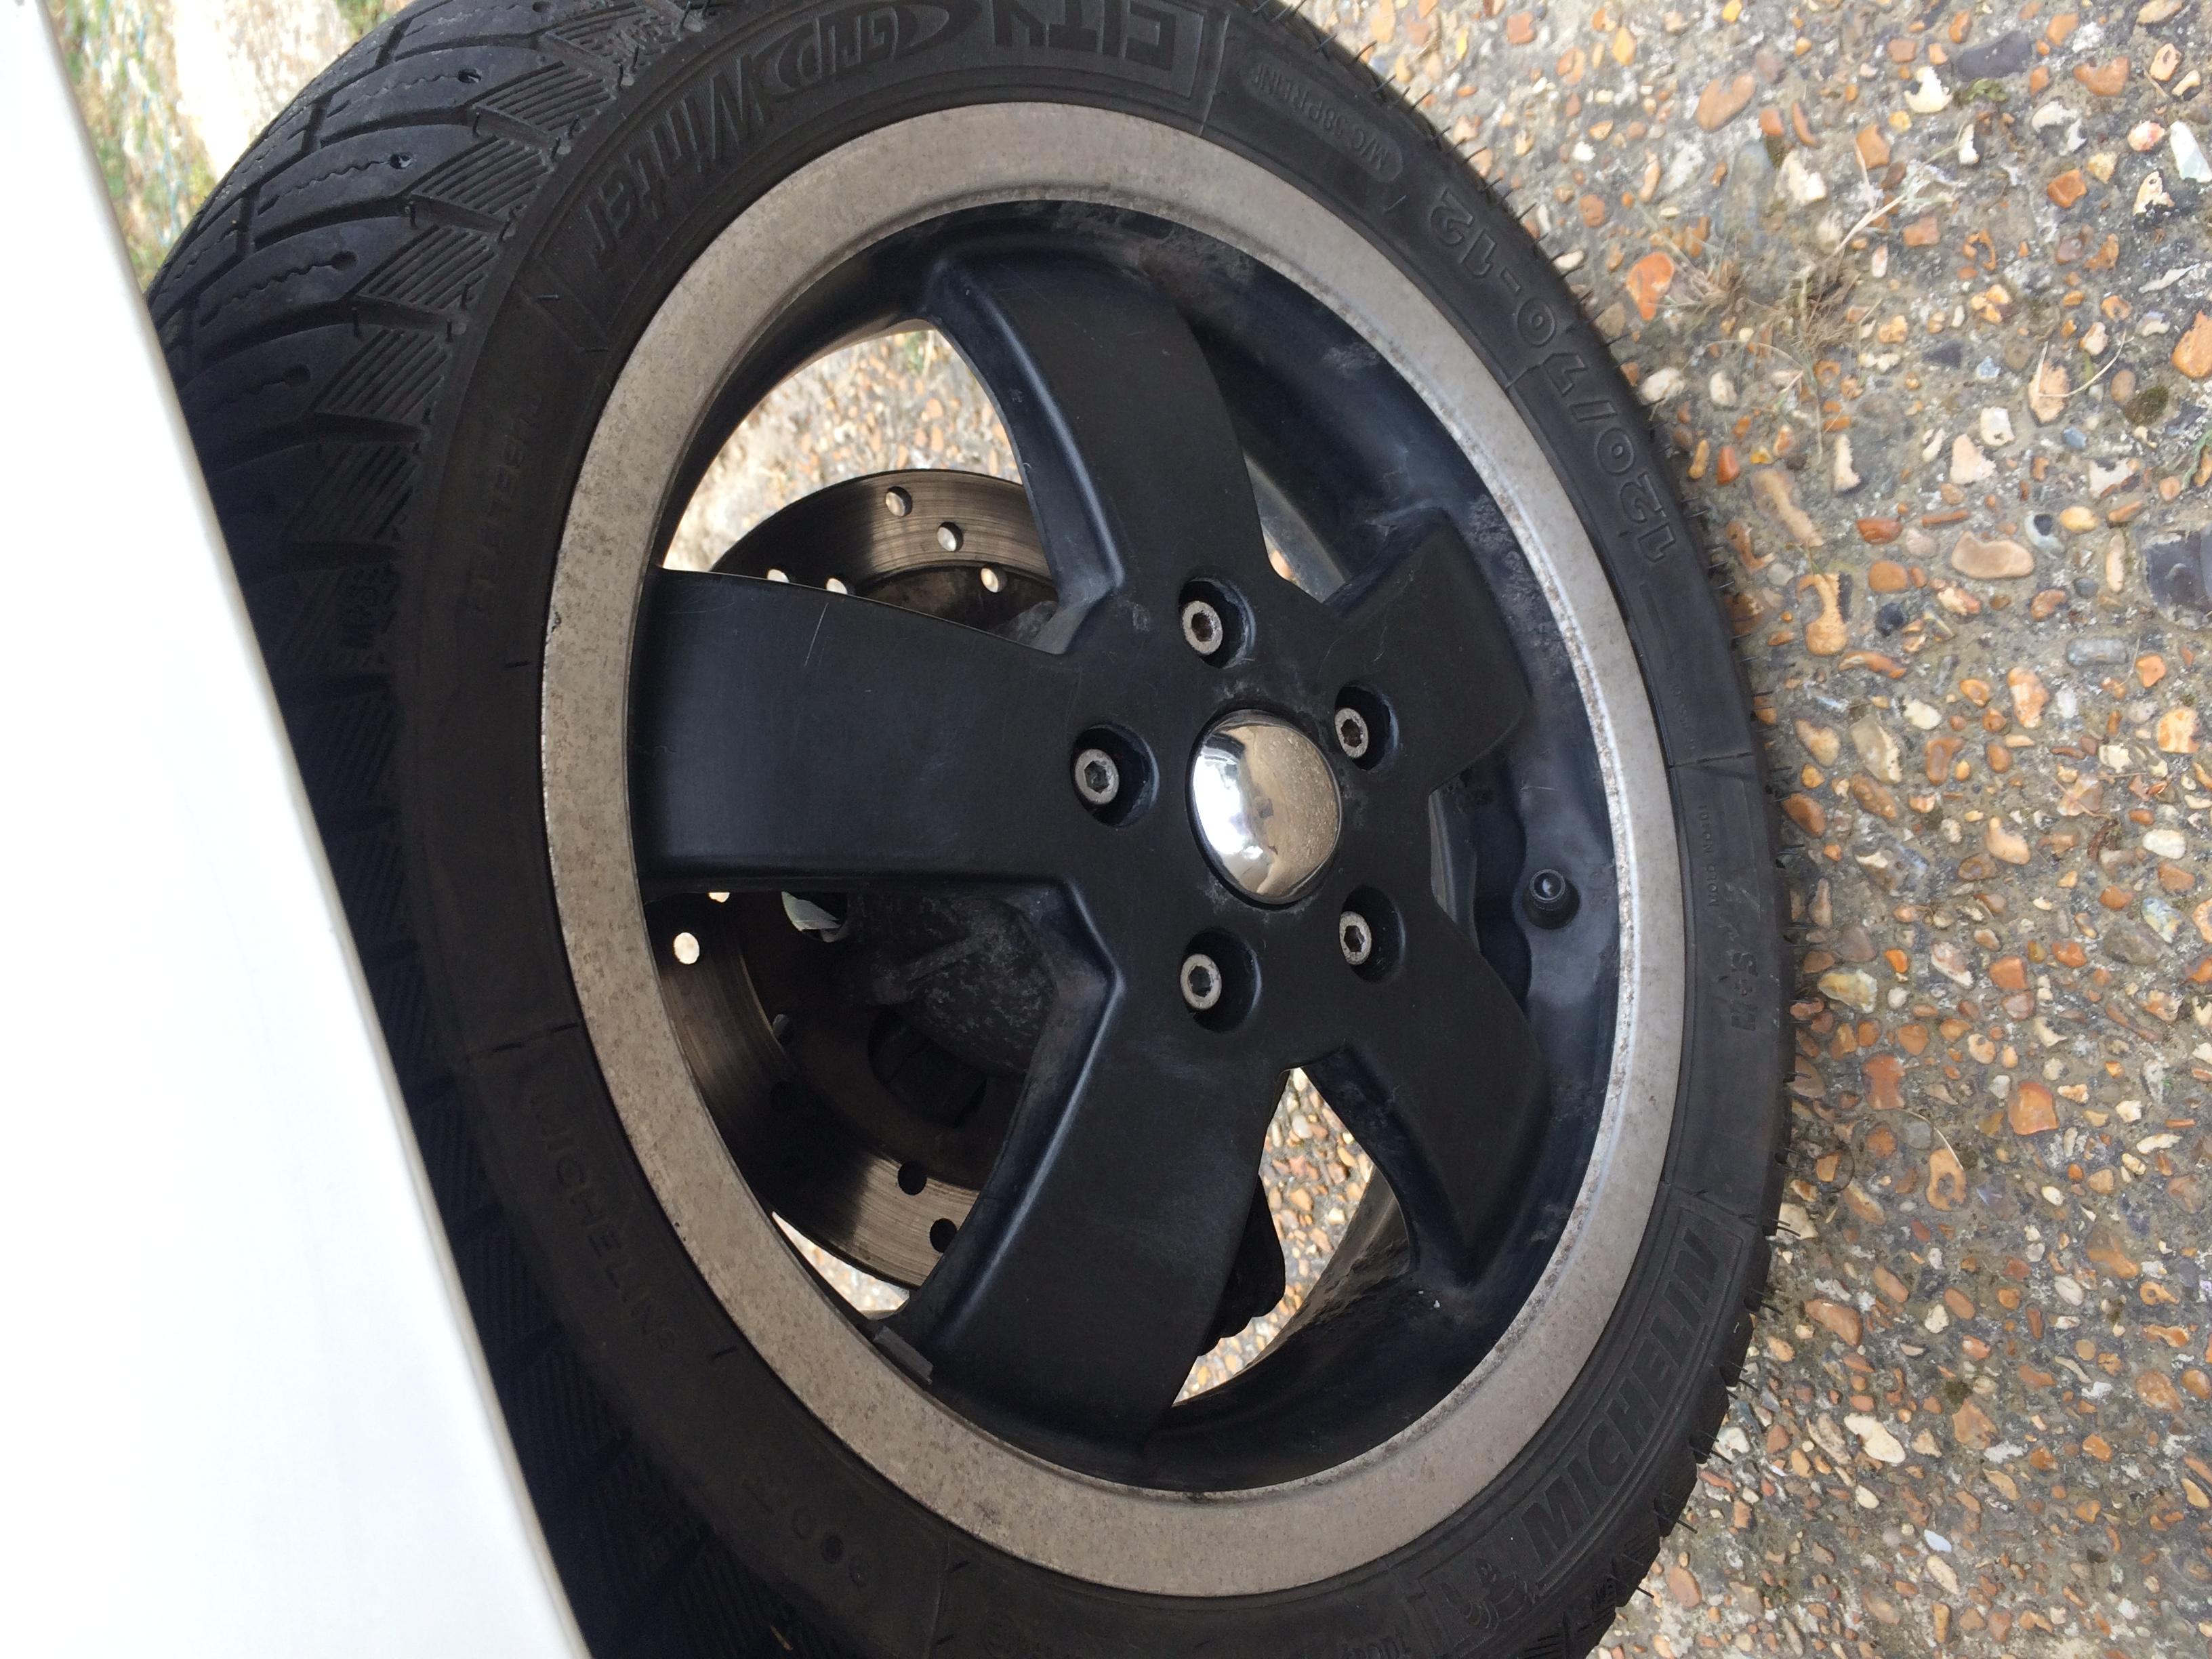 VGTS300 Front Wheel